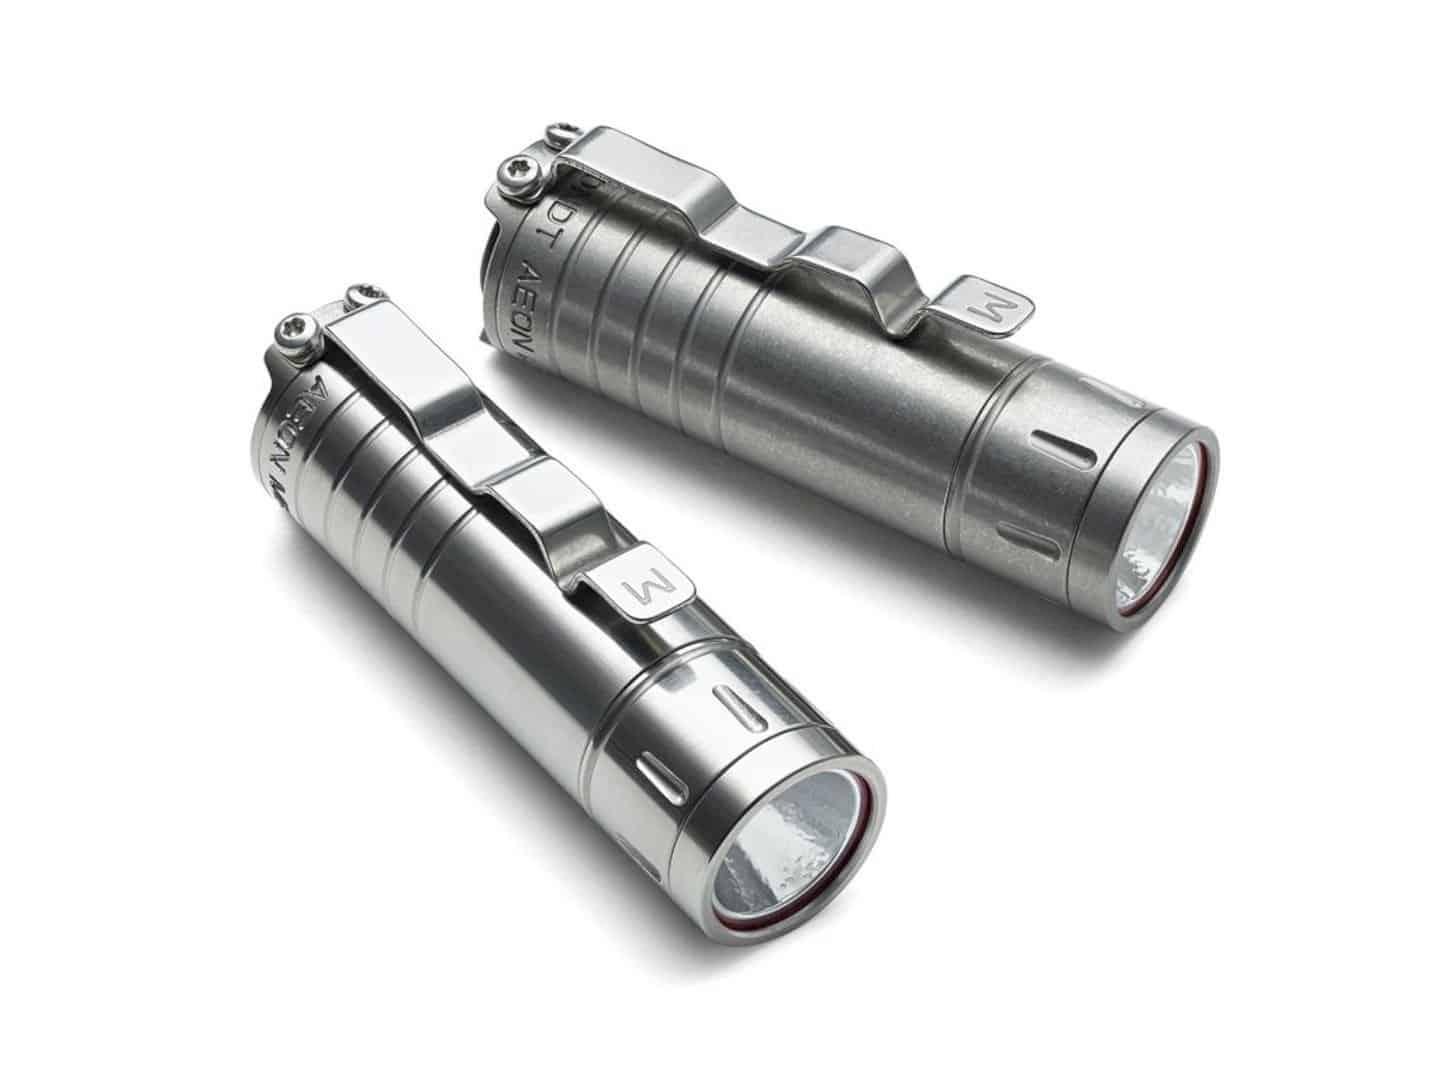 Aeon Mk Iii Electric Torch Titanium Series 2 3